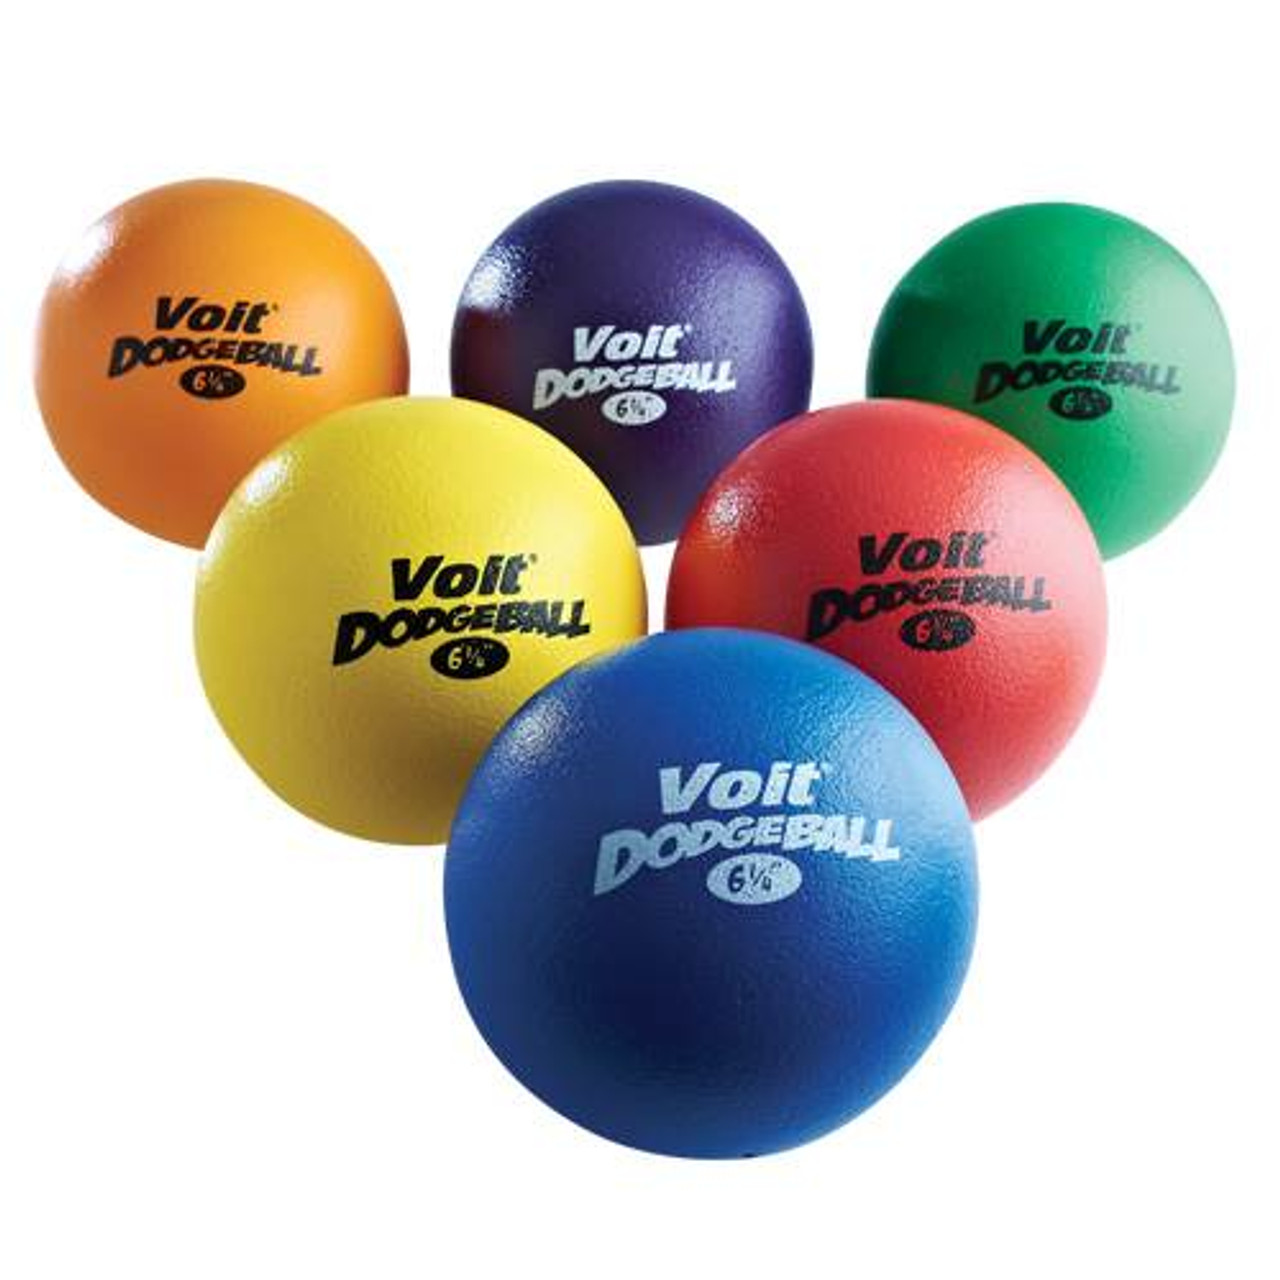 "Voit Tuff 6 1/4"" Dodgeball - Color My Class"